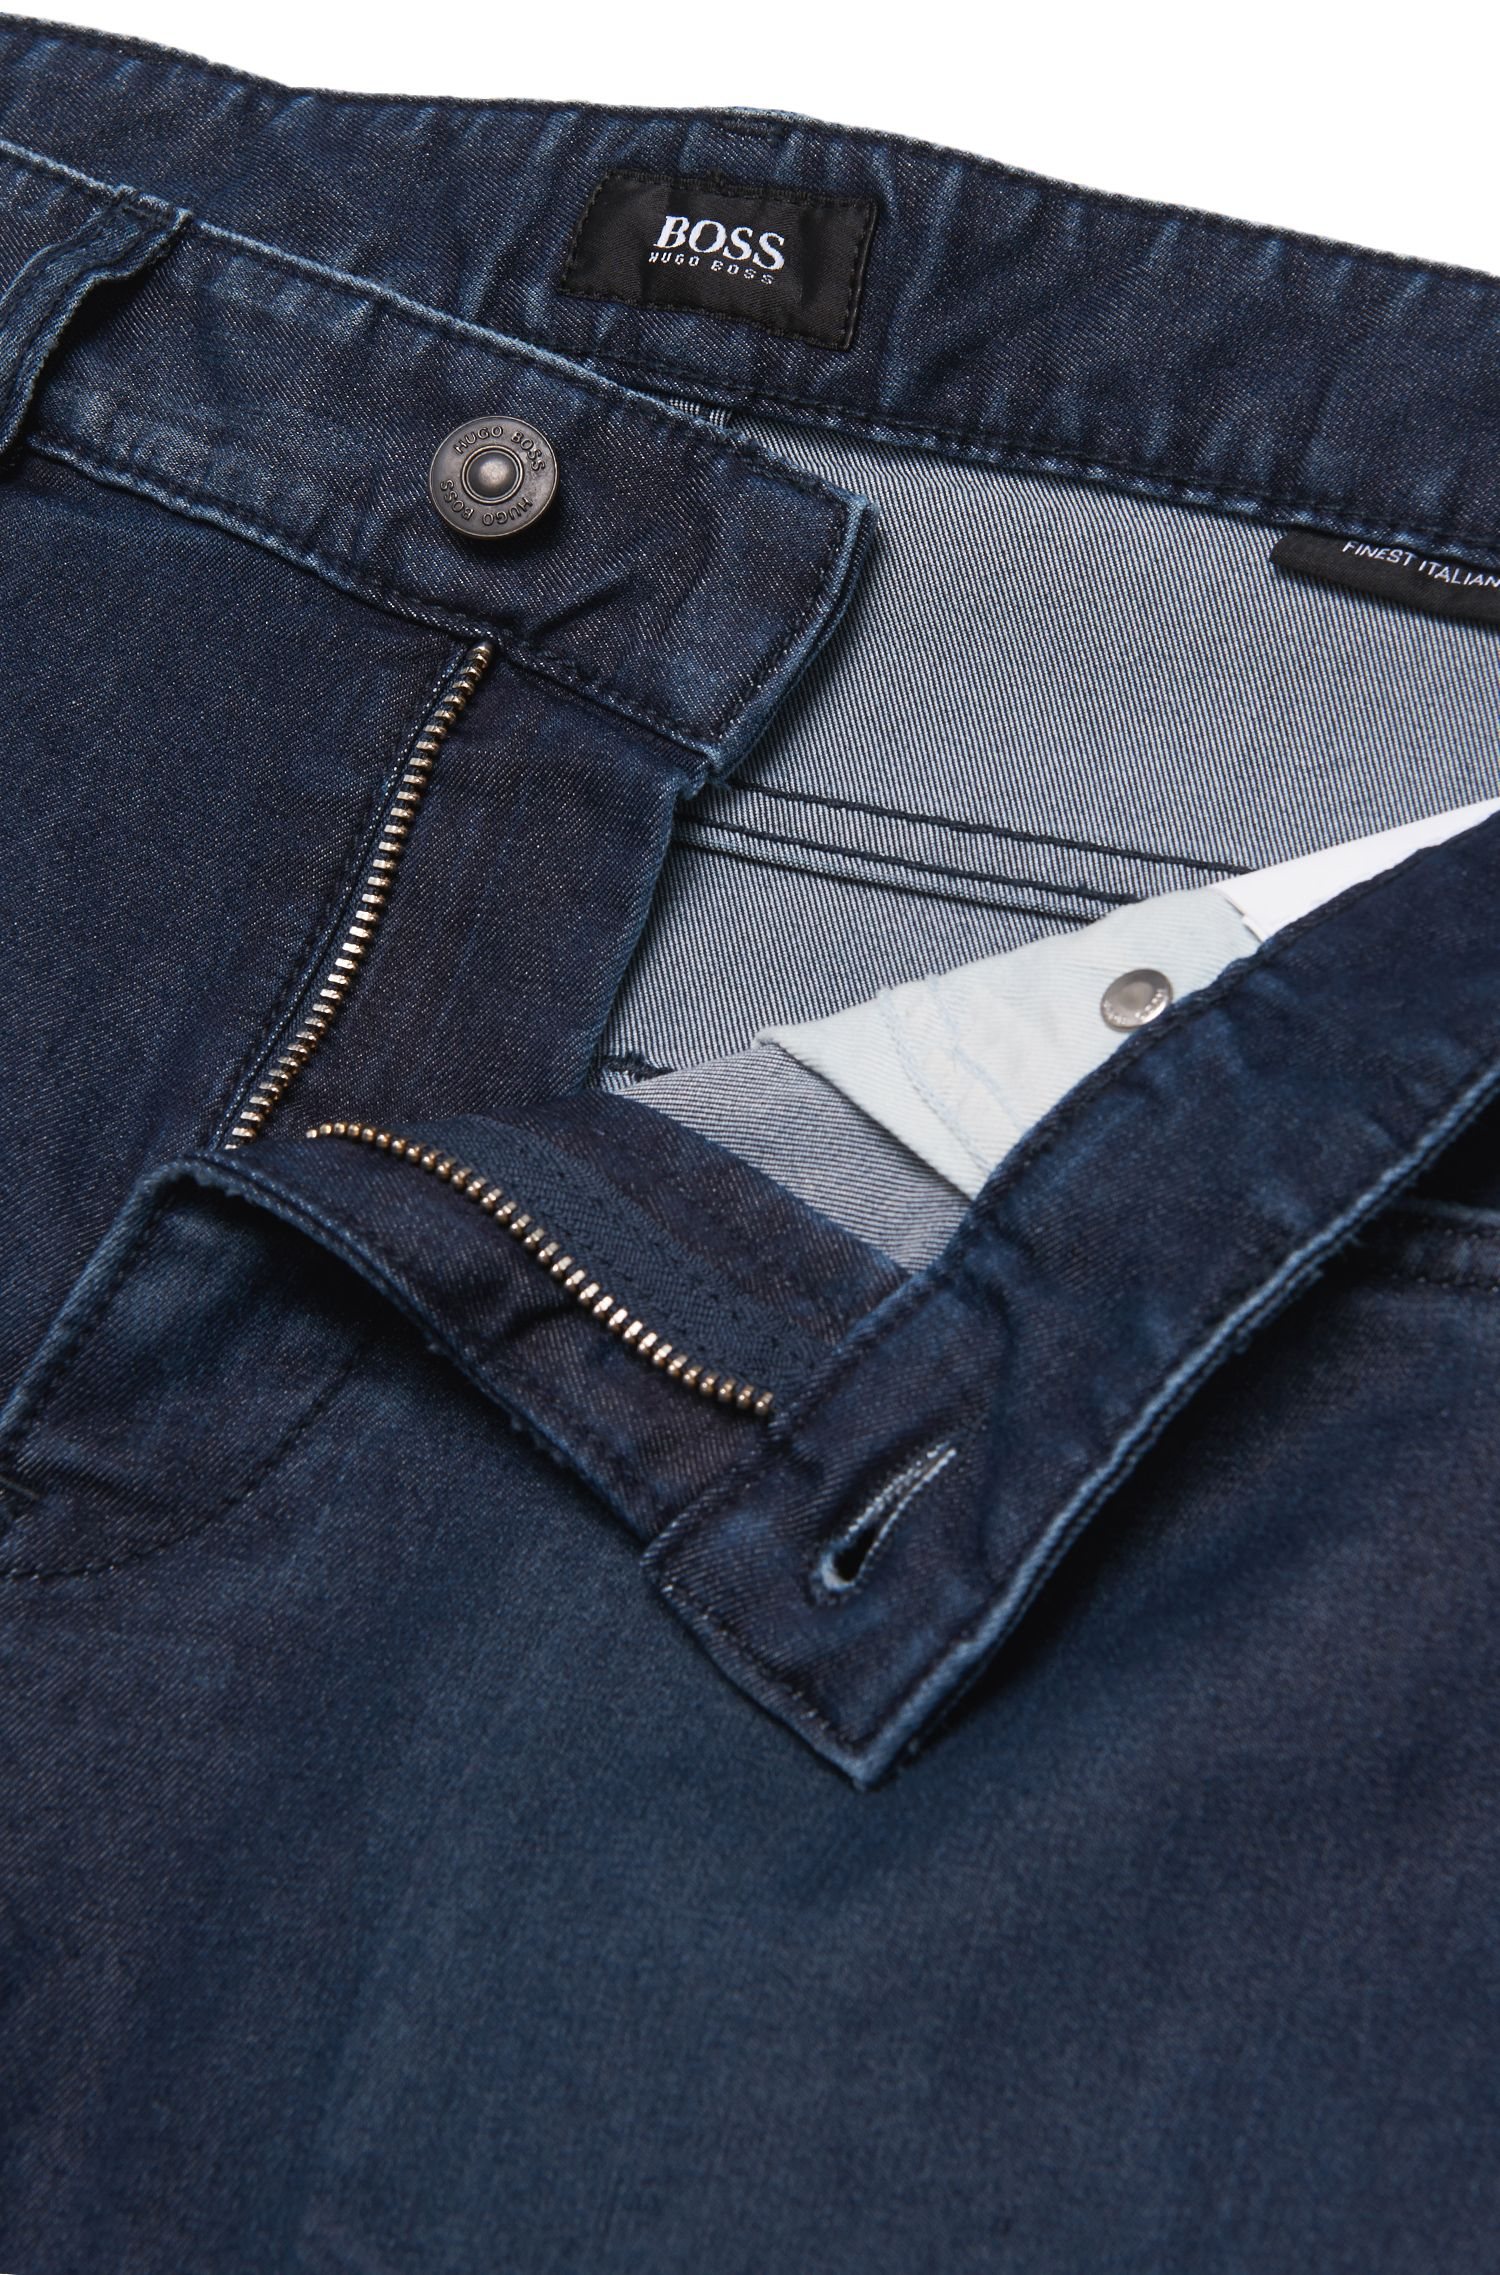 Slim-Fit Jeans aus Baumwoll-Mix: 'Delaware3'